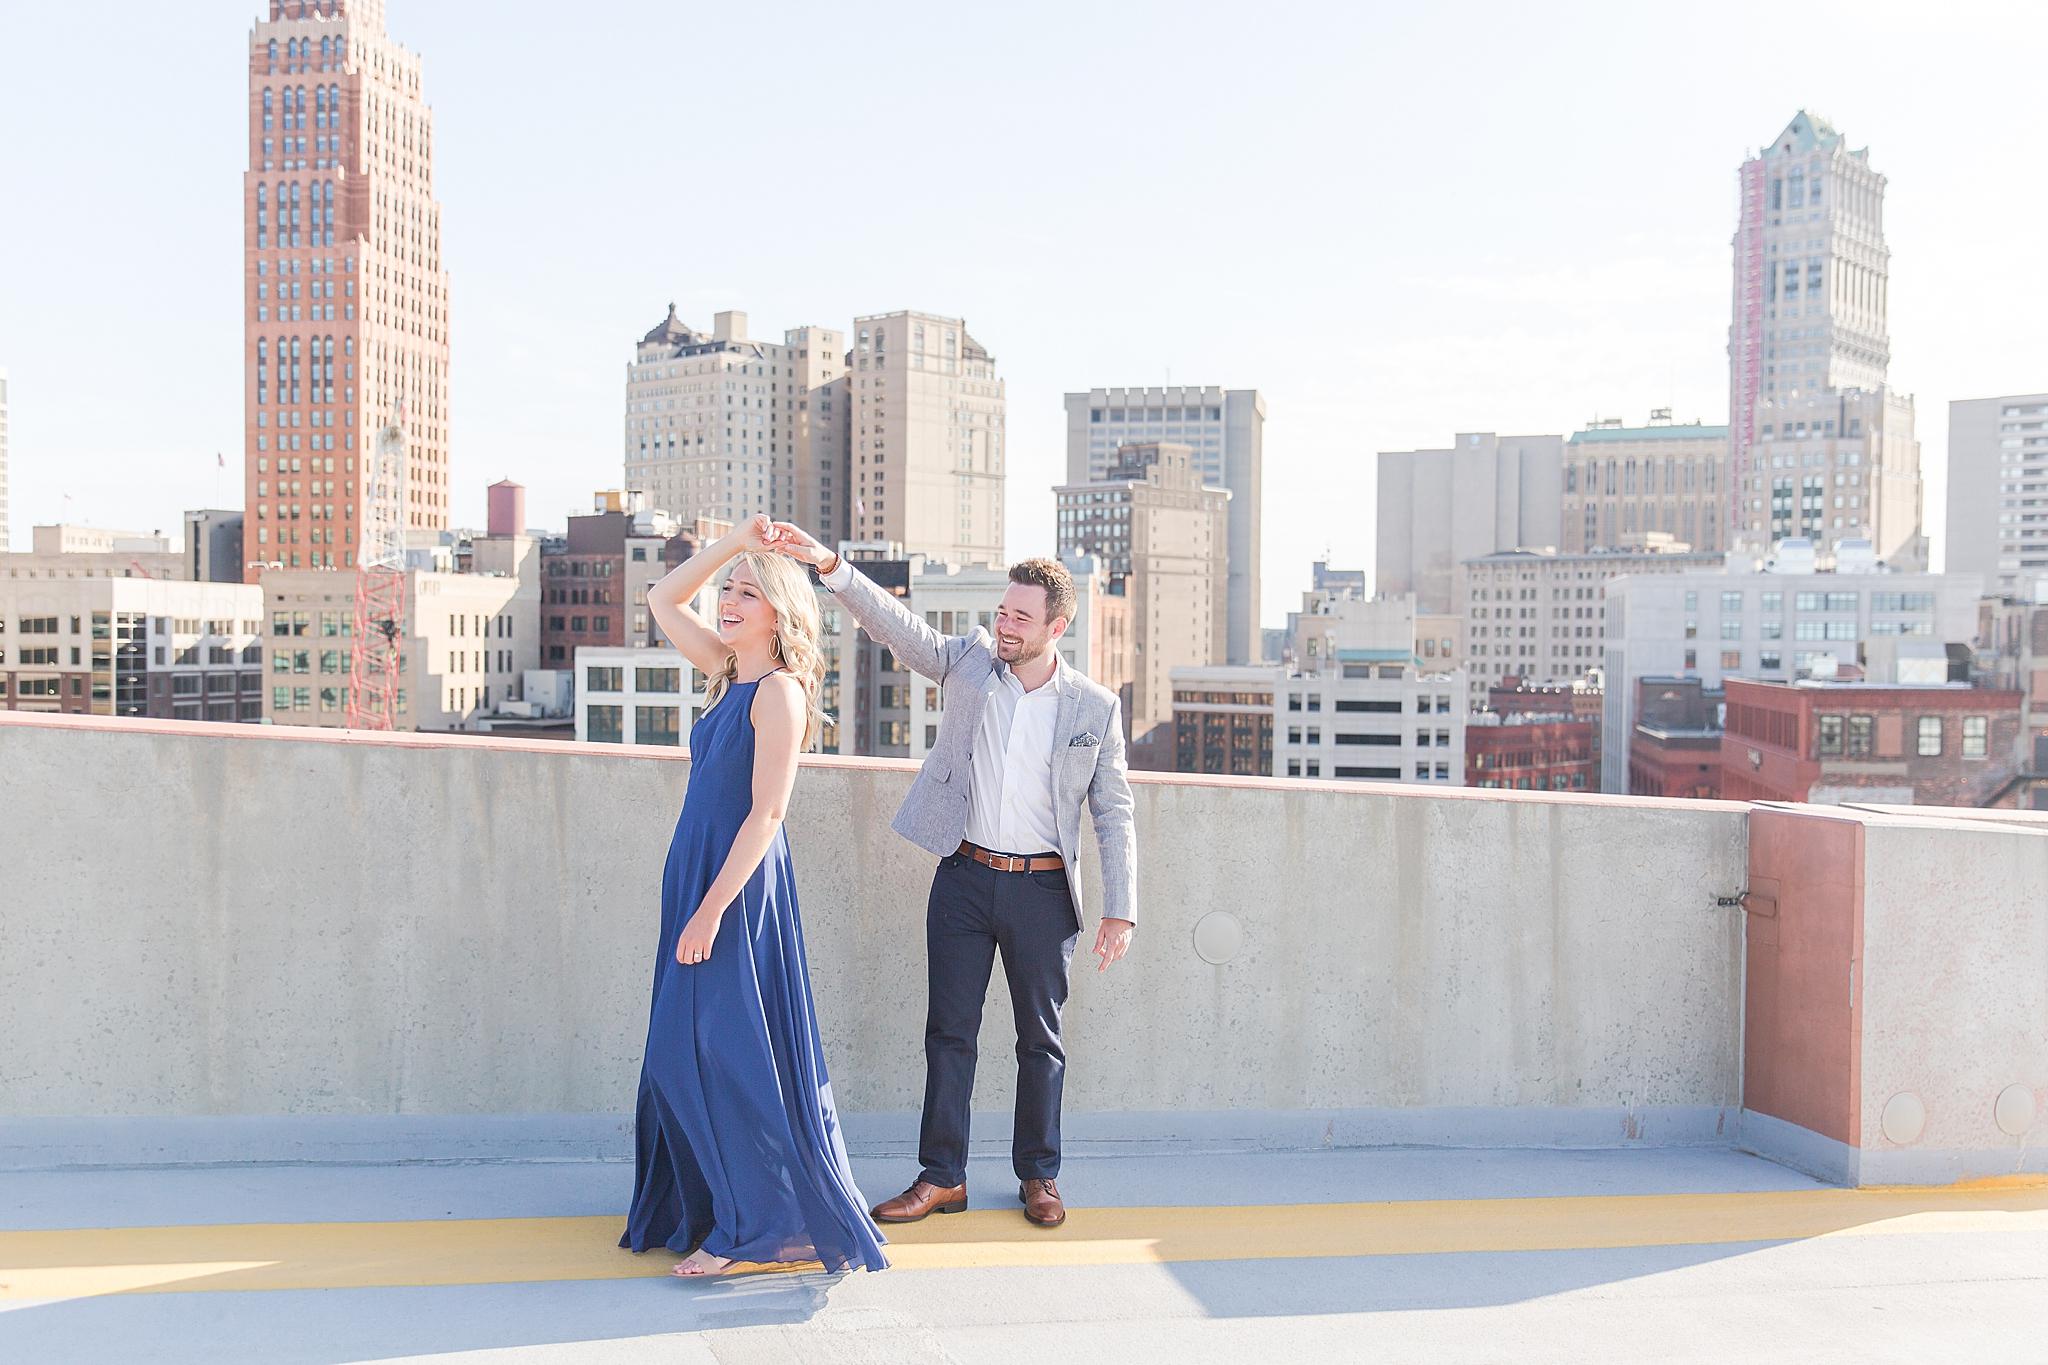 detroit-wedding-photographer-downtown-detroit-belle-isle-engagement-photos-sarah-eric-by-courtney-carolyn-photography_0001.jpg